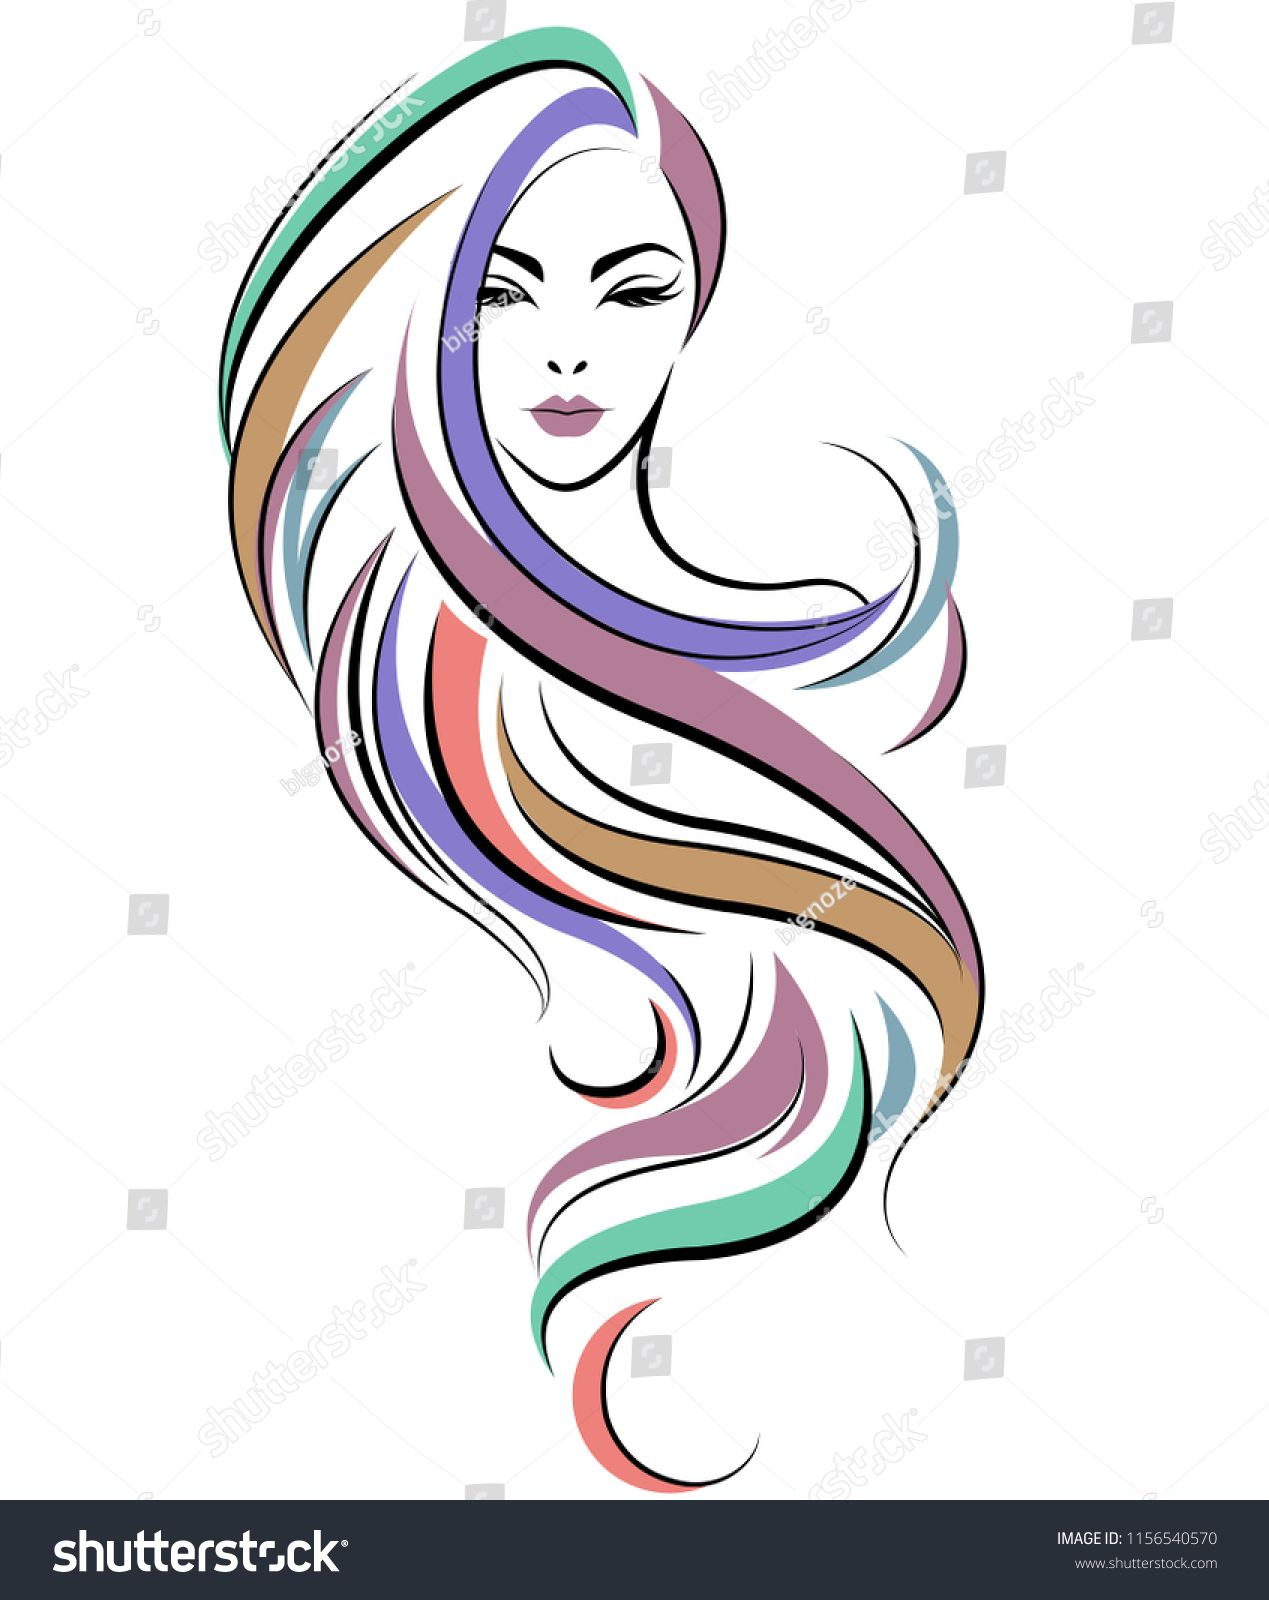 Illustration Of Women Long Hair Style Icon Logo Women Face On White Background Vector Hair Style Long Illustration In 2020 Hair Salon Art Pattern Art Hair Logo